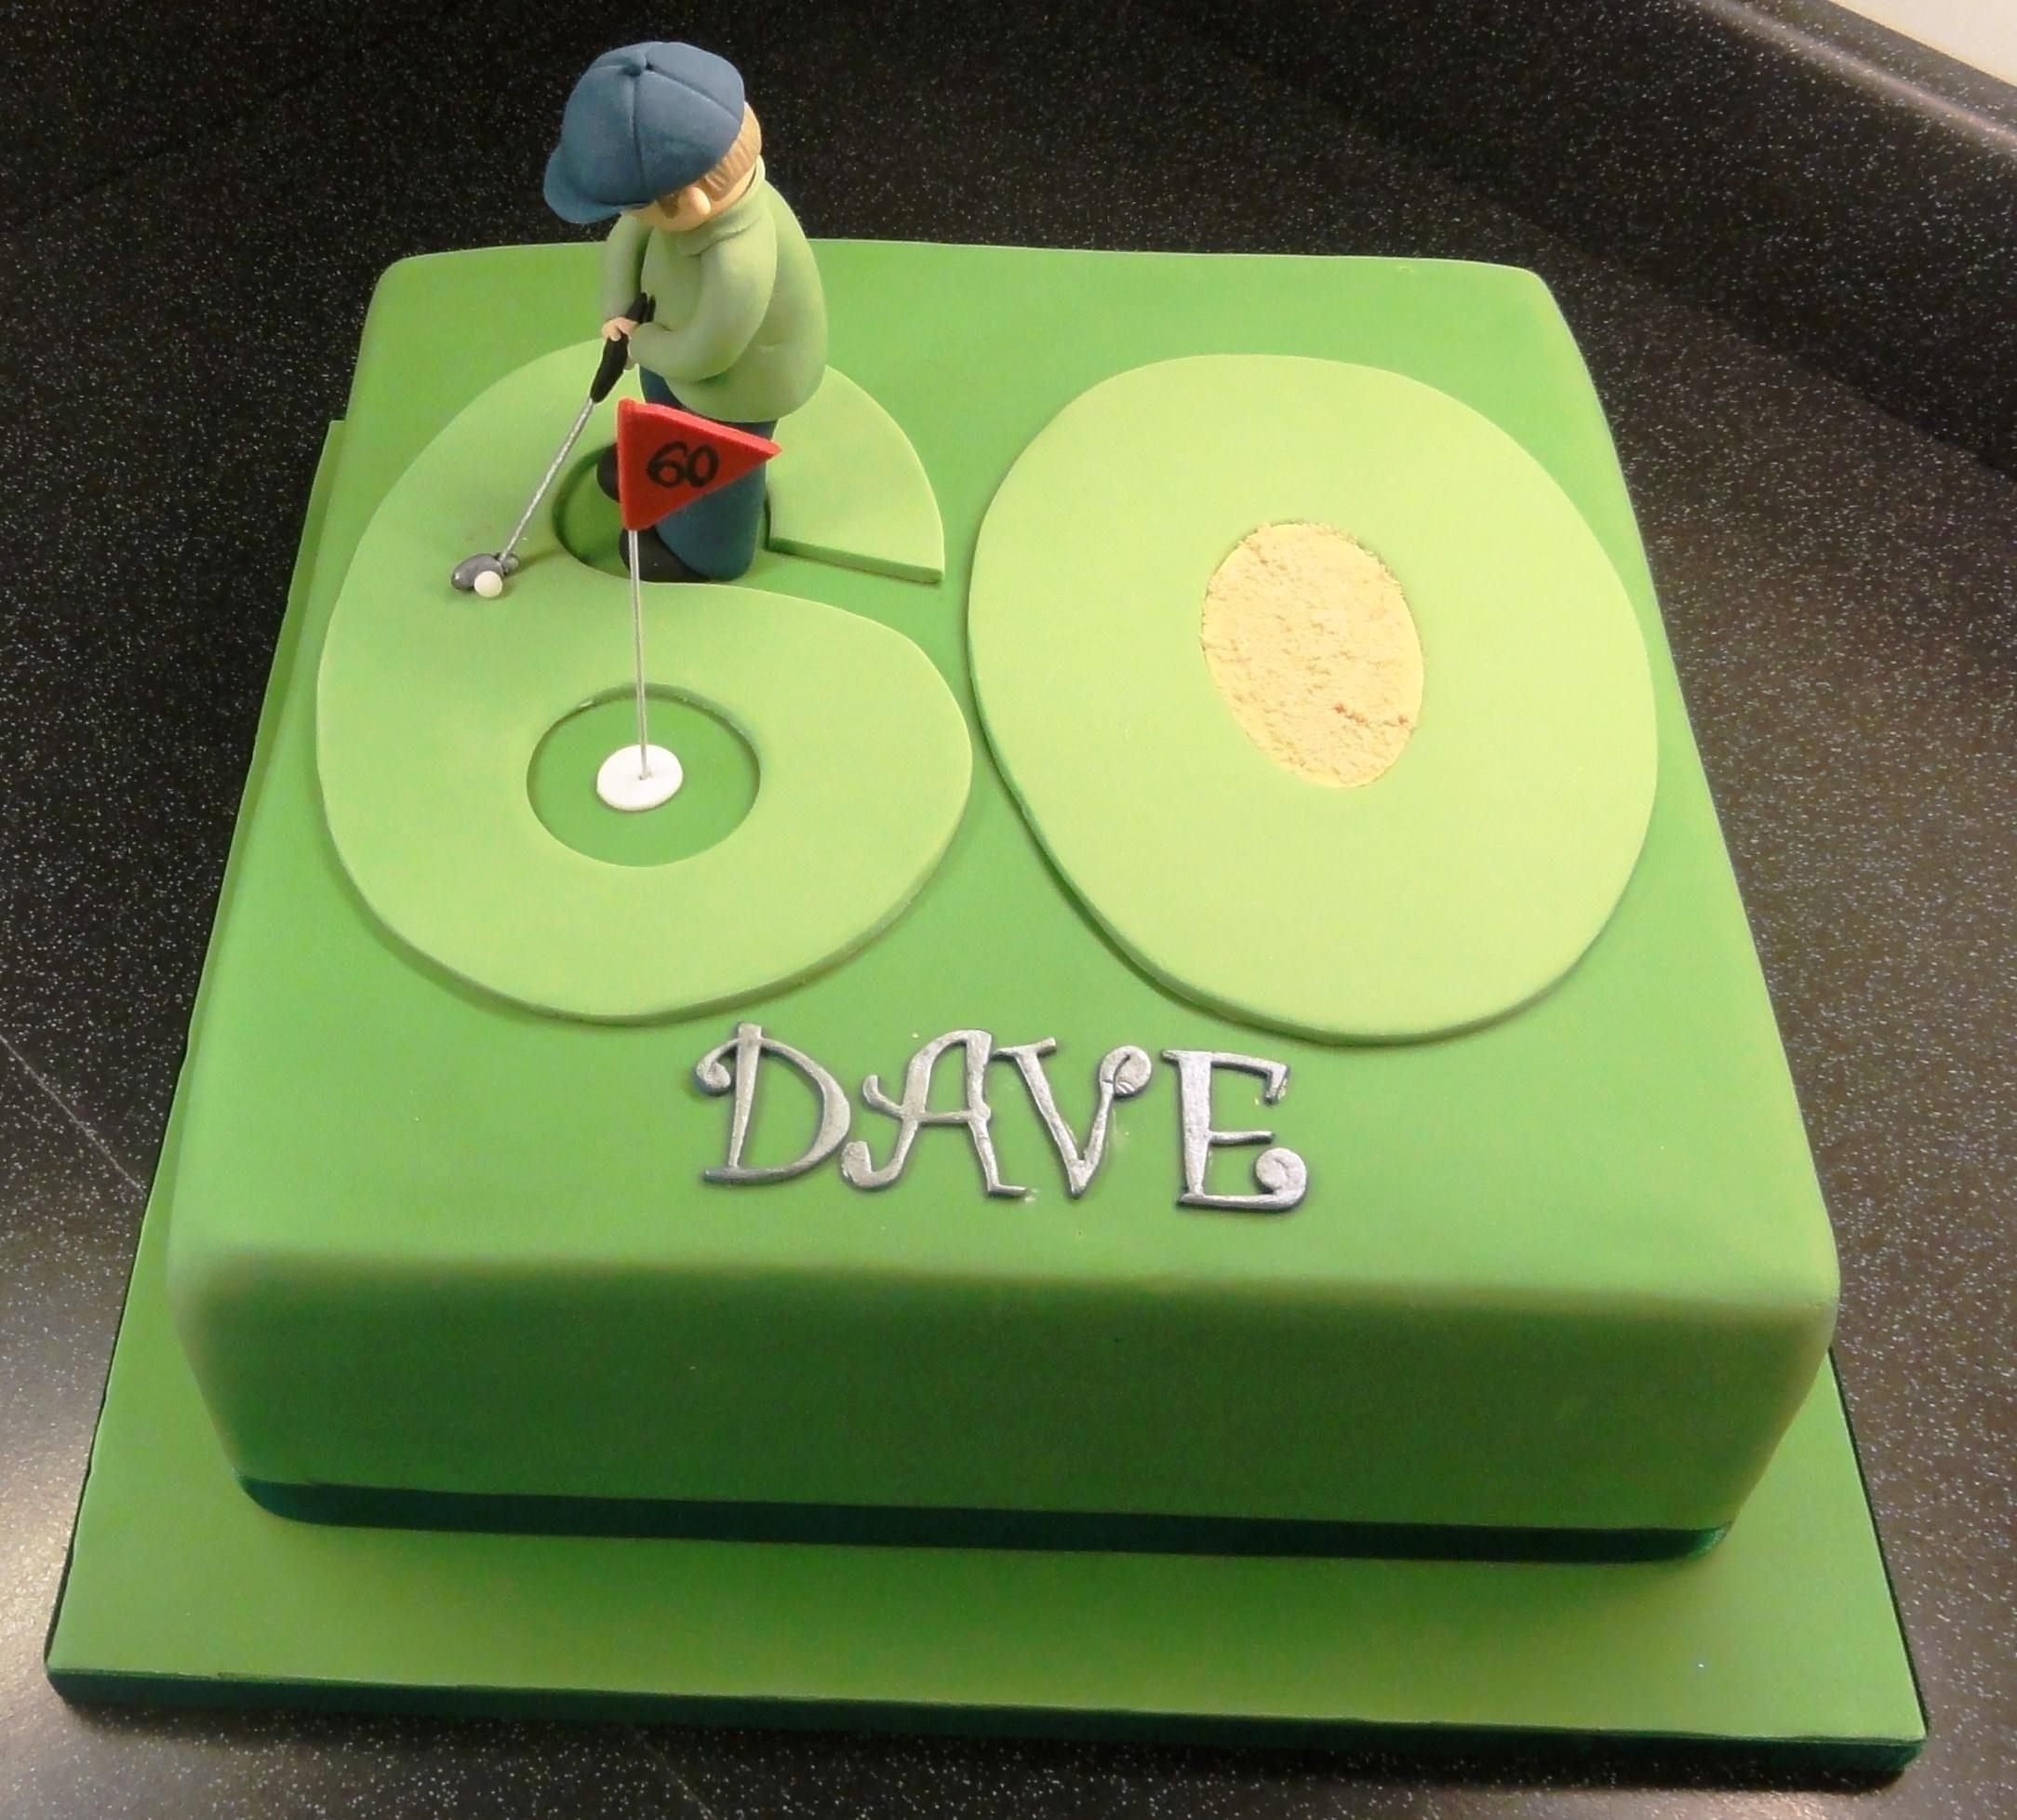 60th Birthday Cakes Designs Ideas